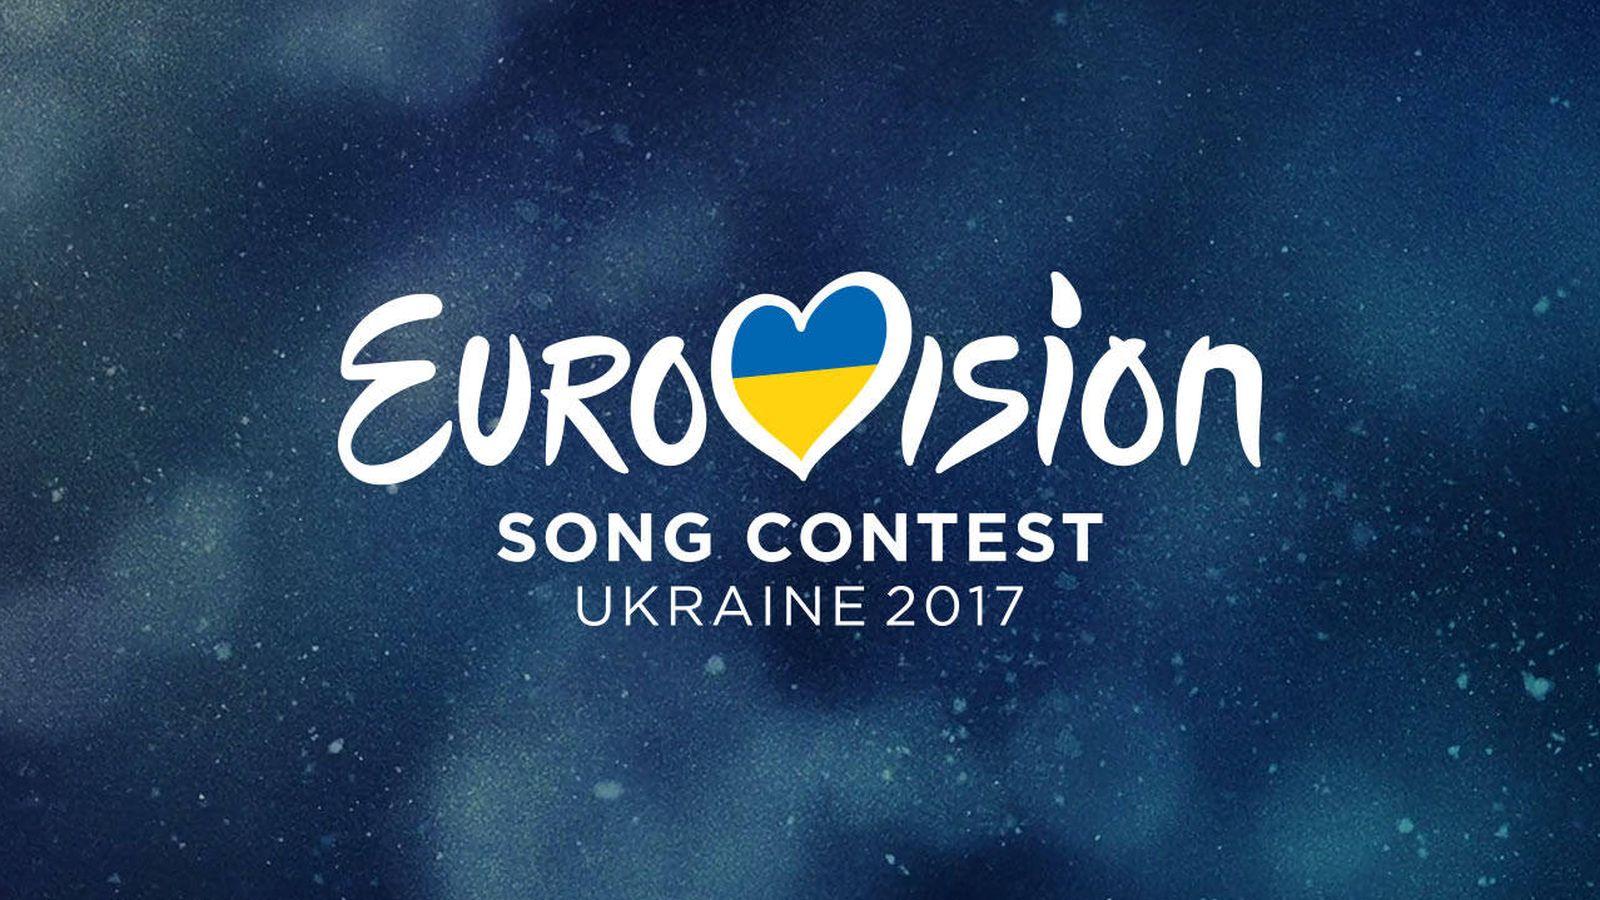 Eurovisión 2017 El Equipo Organizador De Eurovisión 2017 En Ucrania